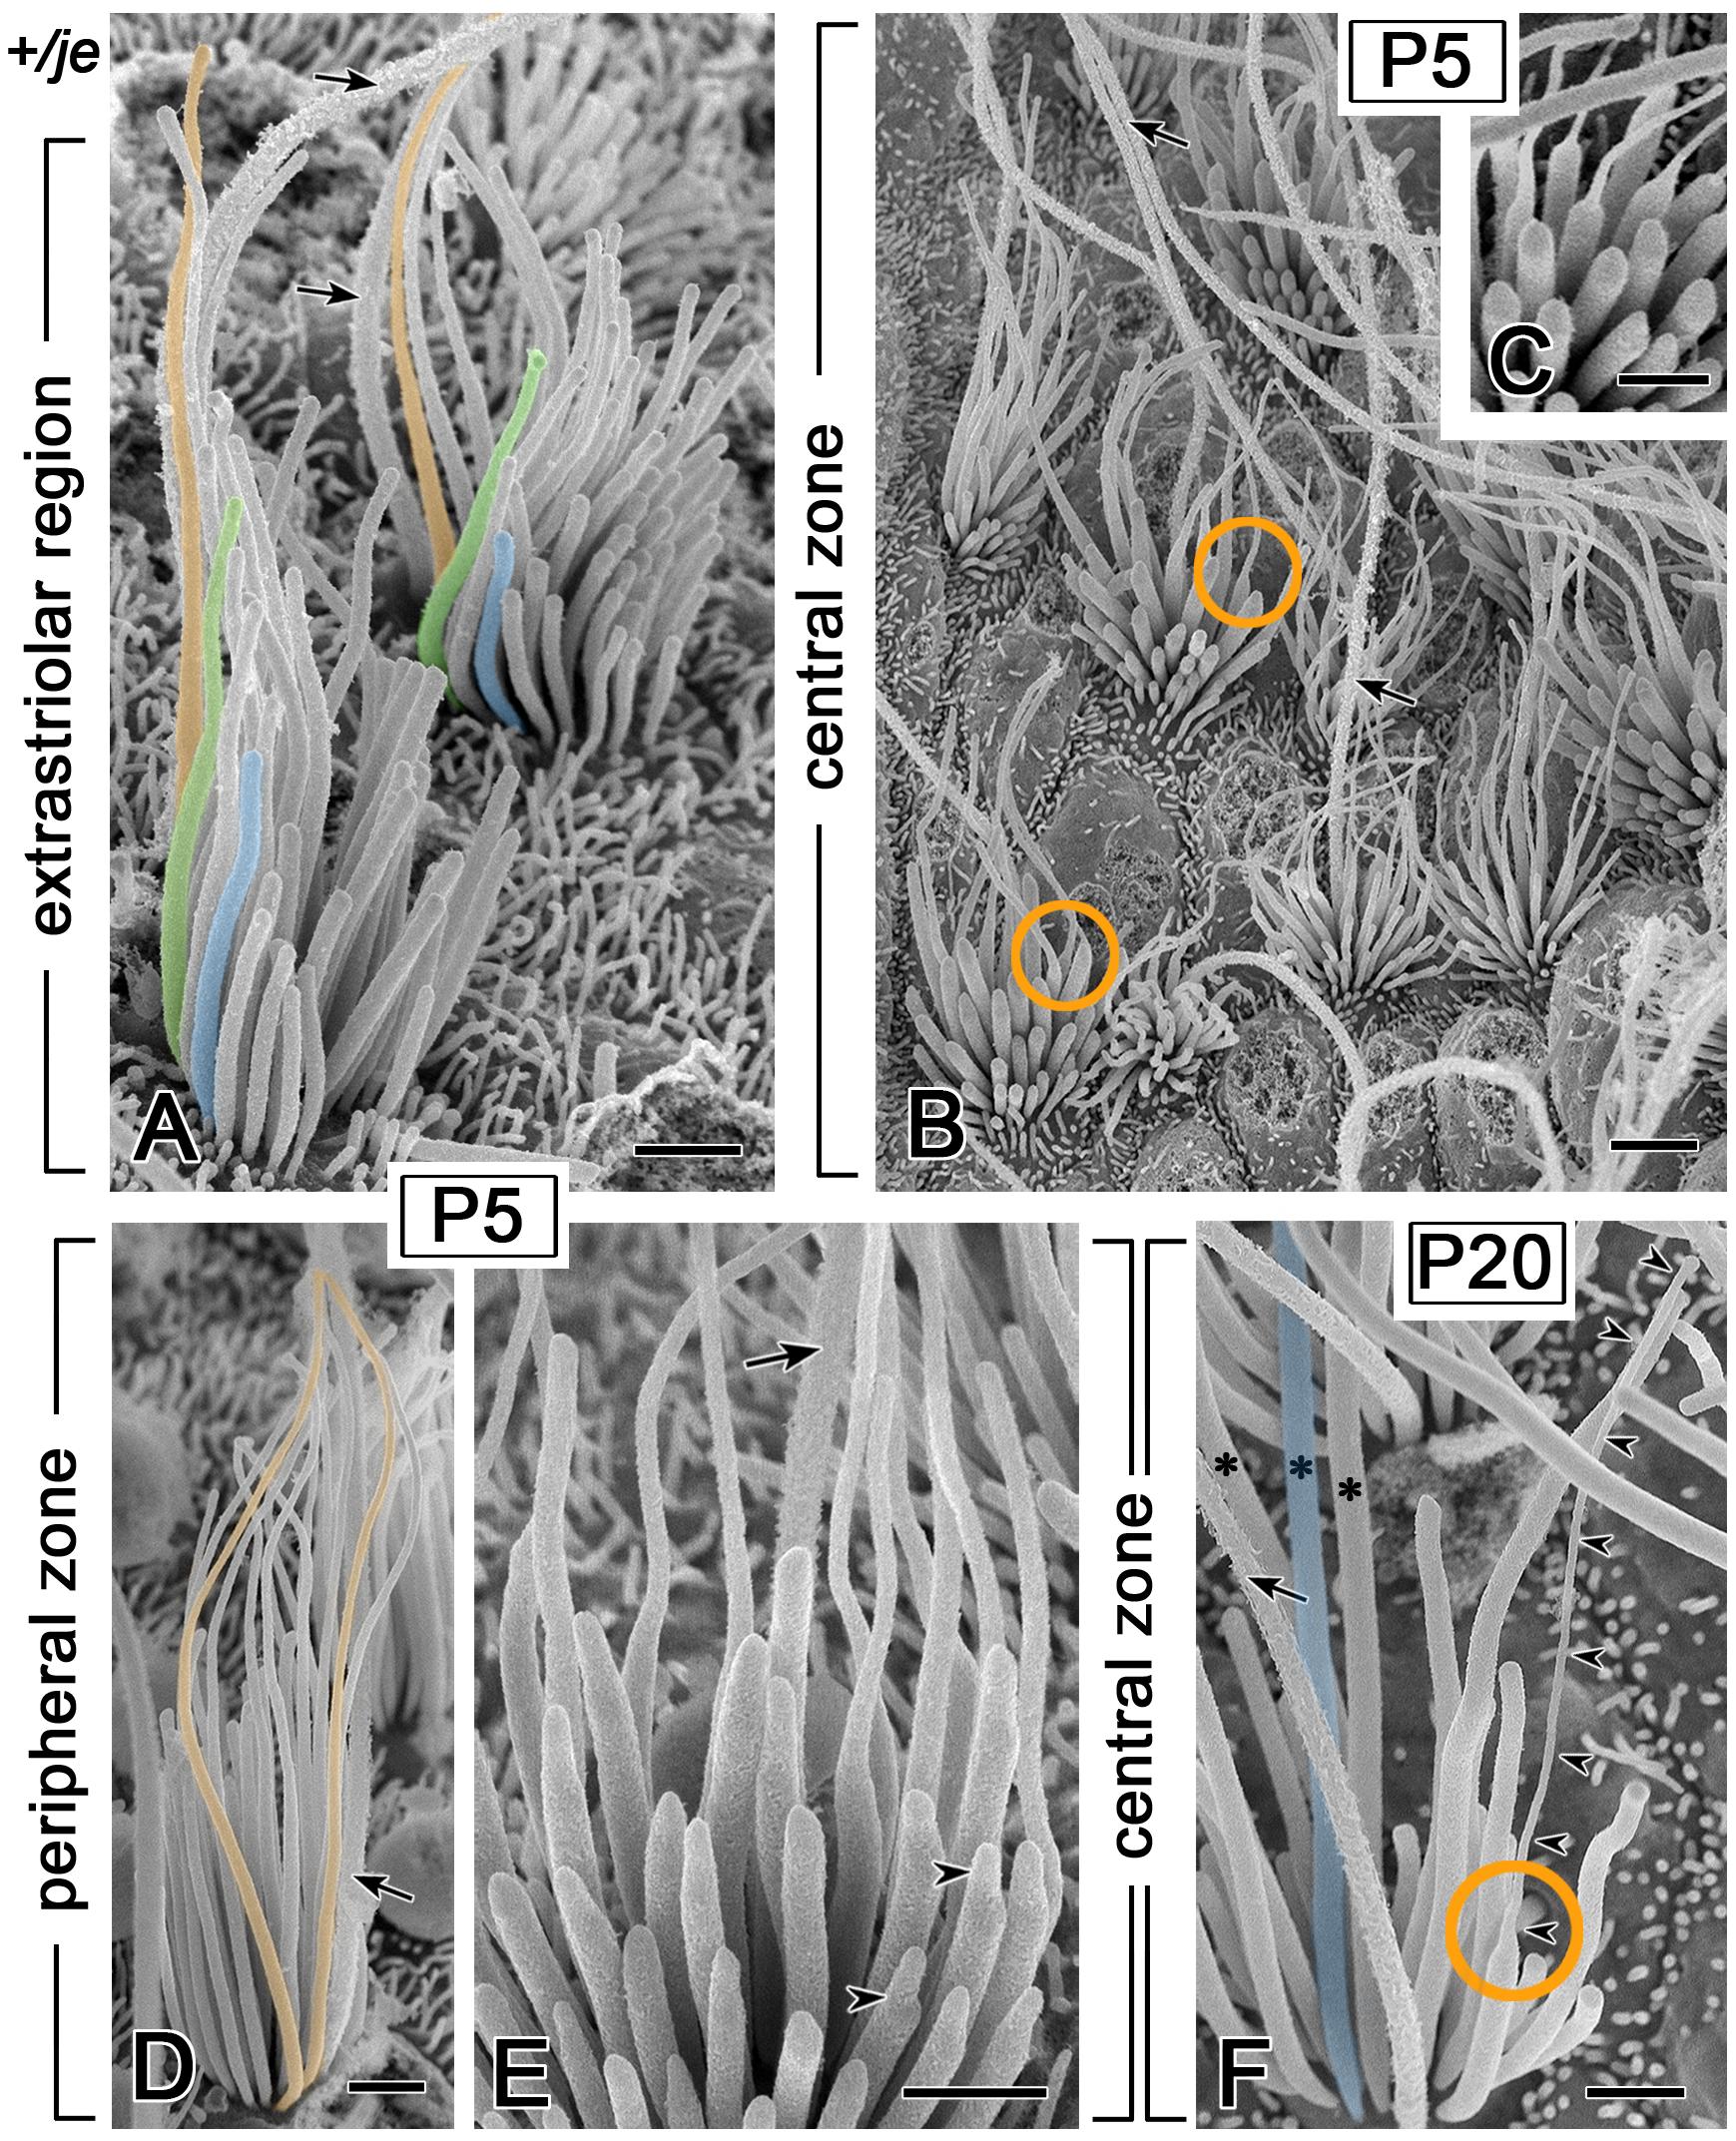 Transient tapering of stereocilia on the vestibular hair cells of <i>+/je</i> mice.